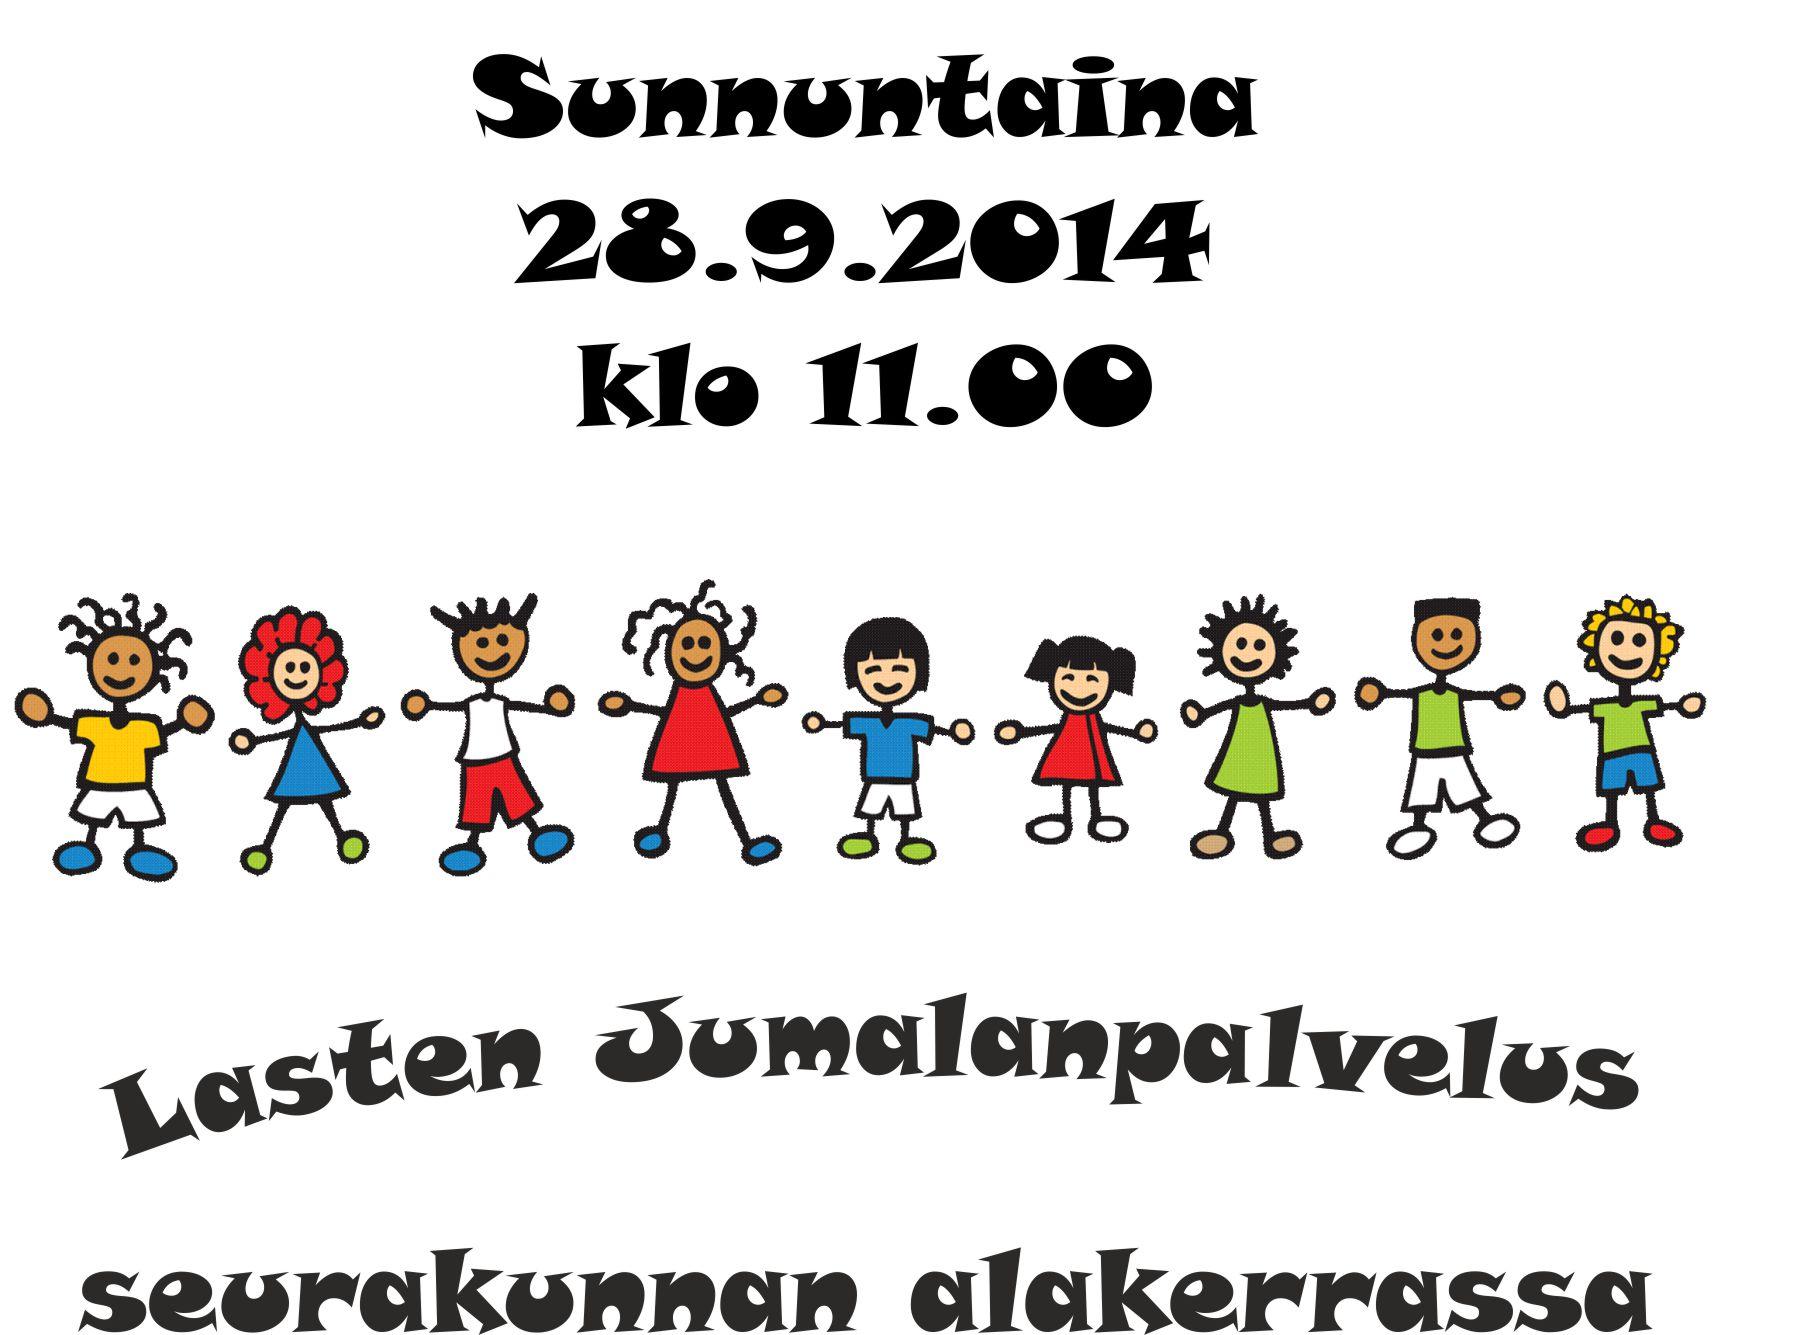 LastenJumalanpalvelus20140928